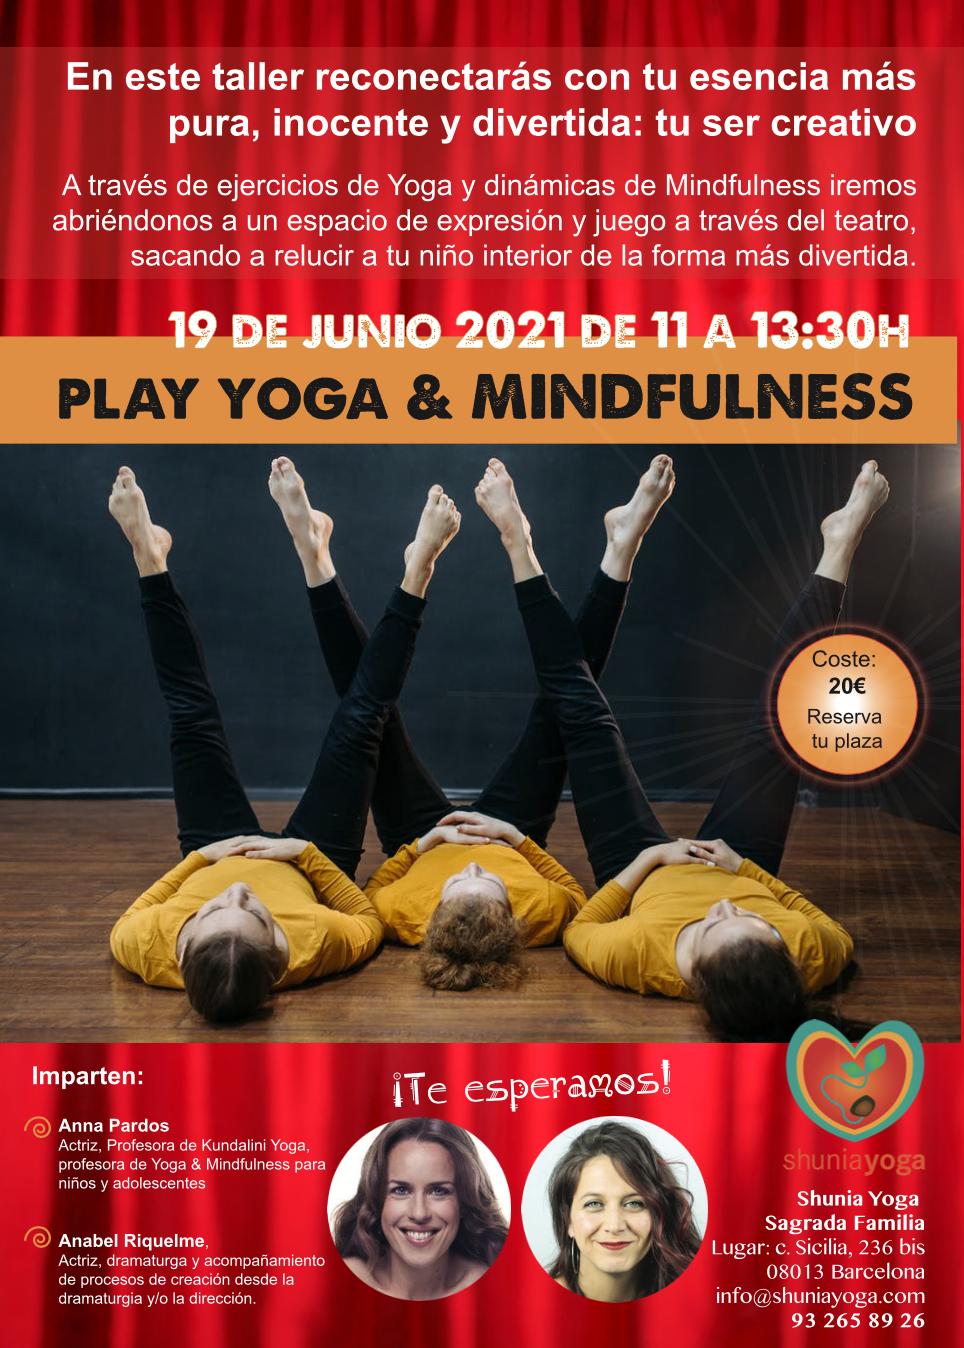 Taller Play Yoga & Mindfulness con Anna Pardos y Anabel Riquelme